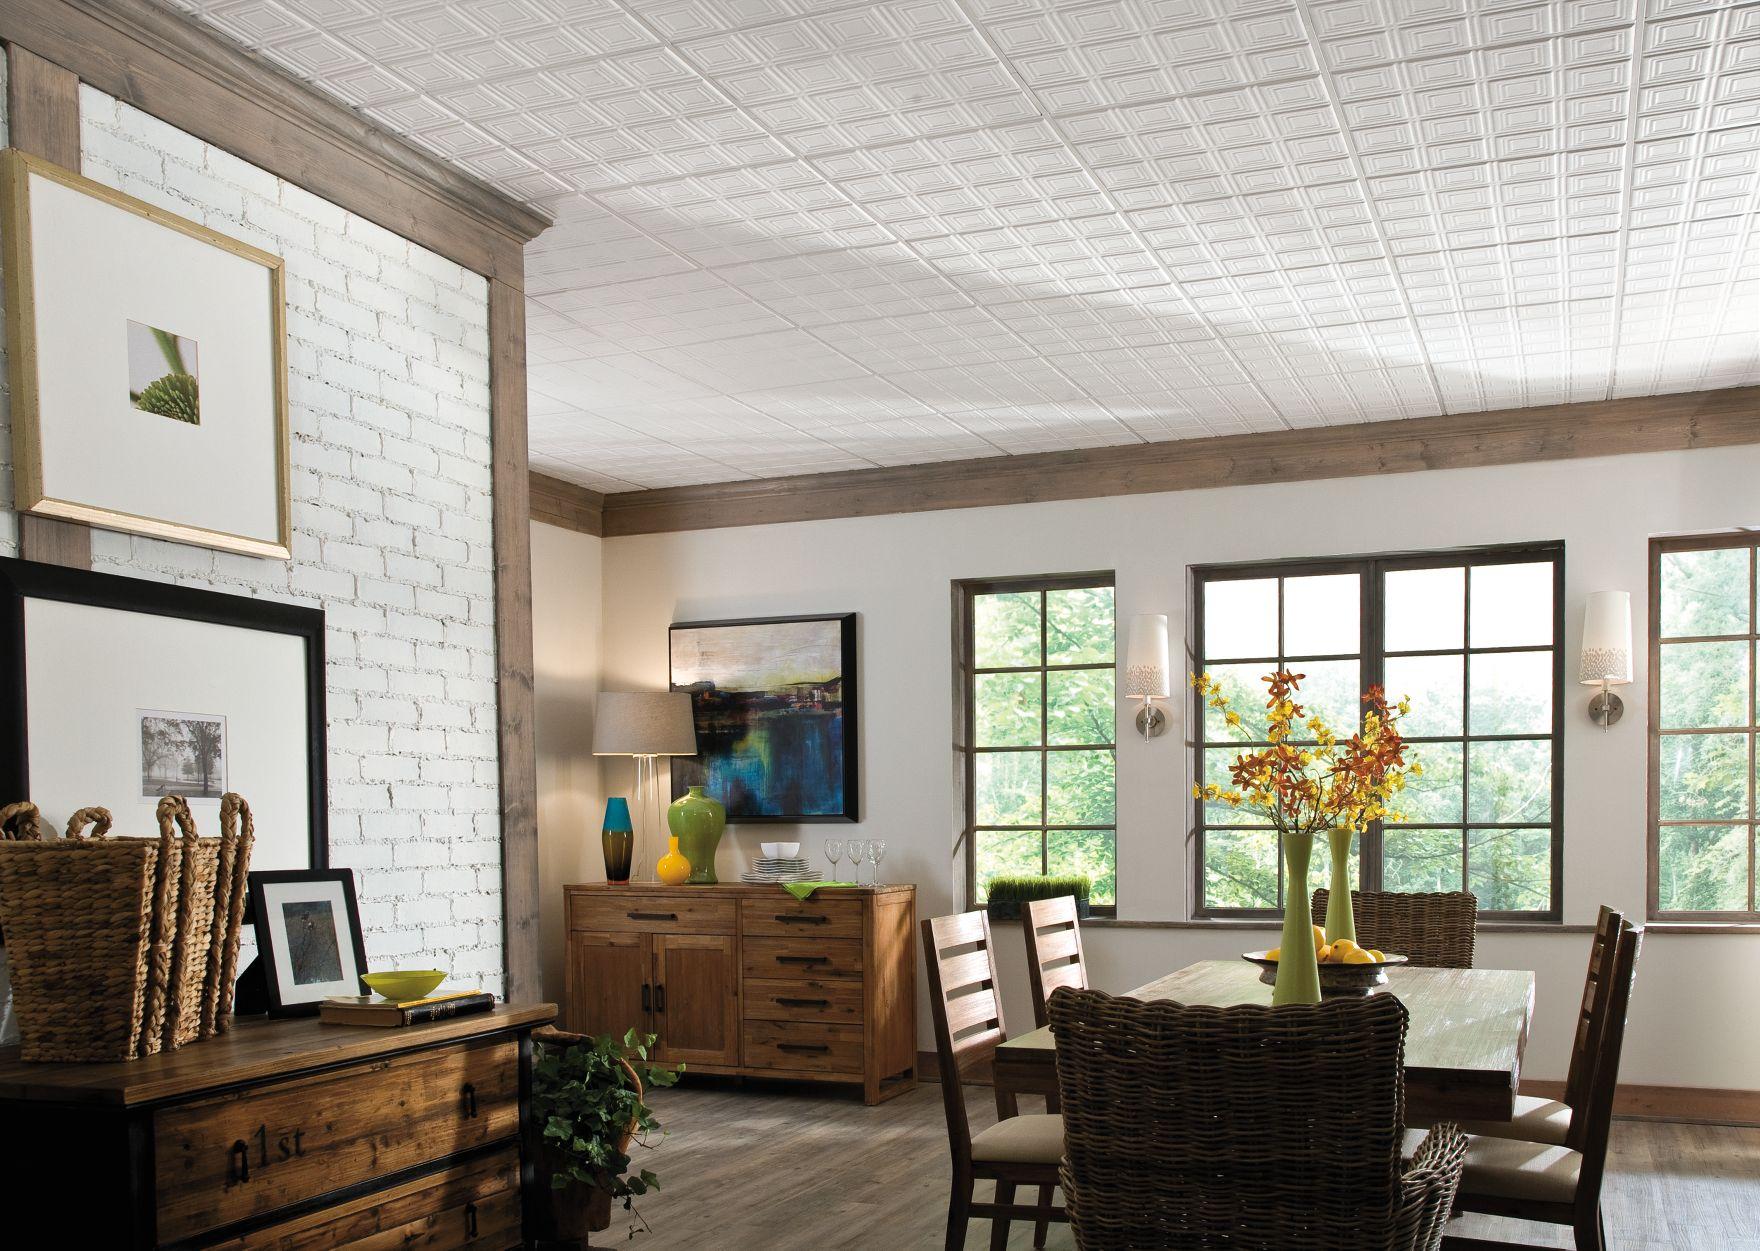 Ceiling tiles look like wood ceilling100 opaque ceiling tiles remodelando la casa dailygadgetfo Gallery